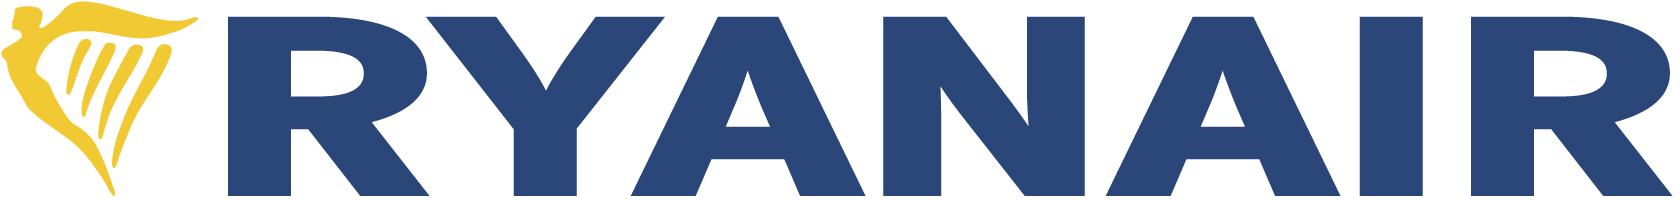 Ryanair_logo_2013-.png